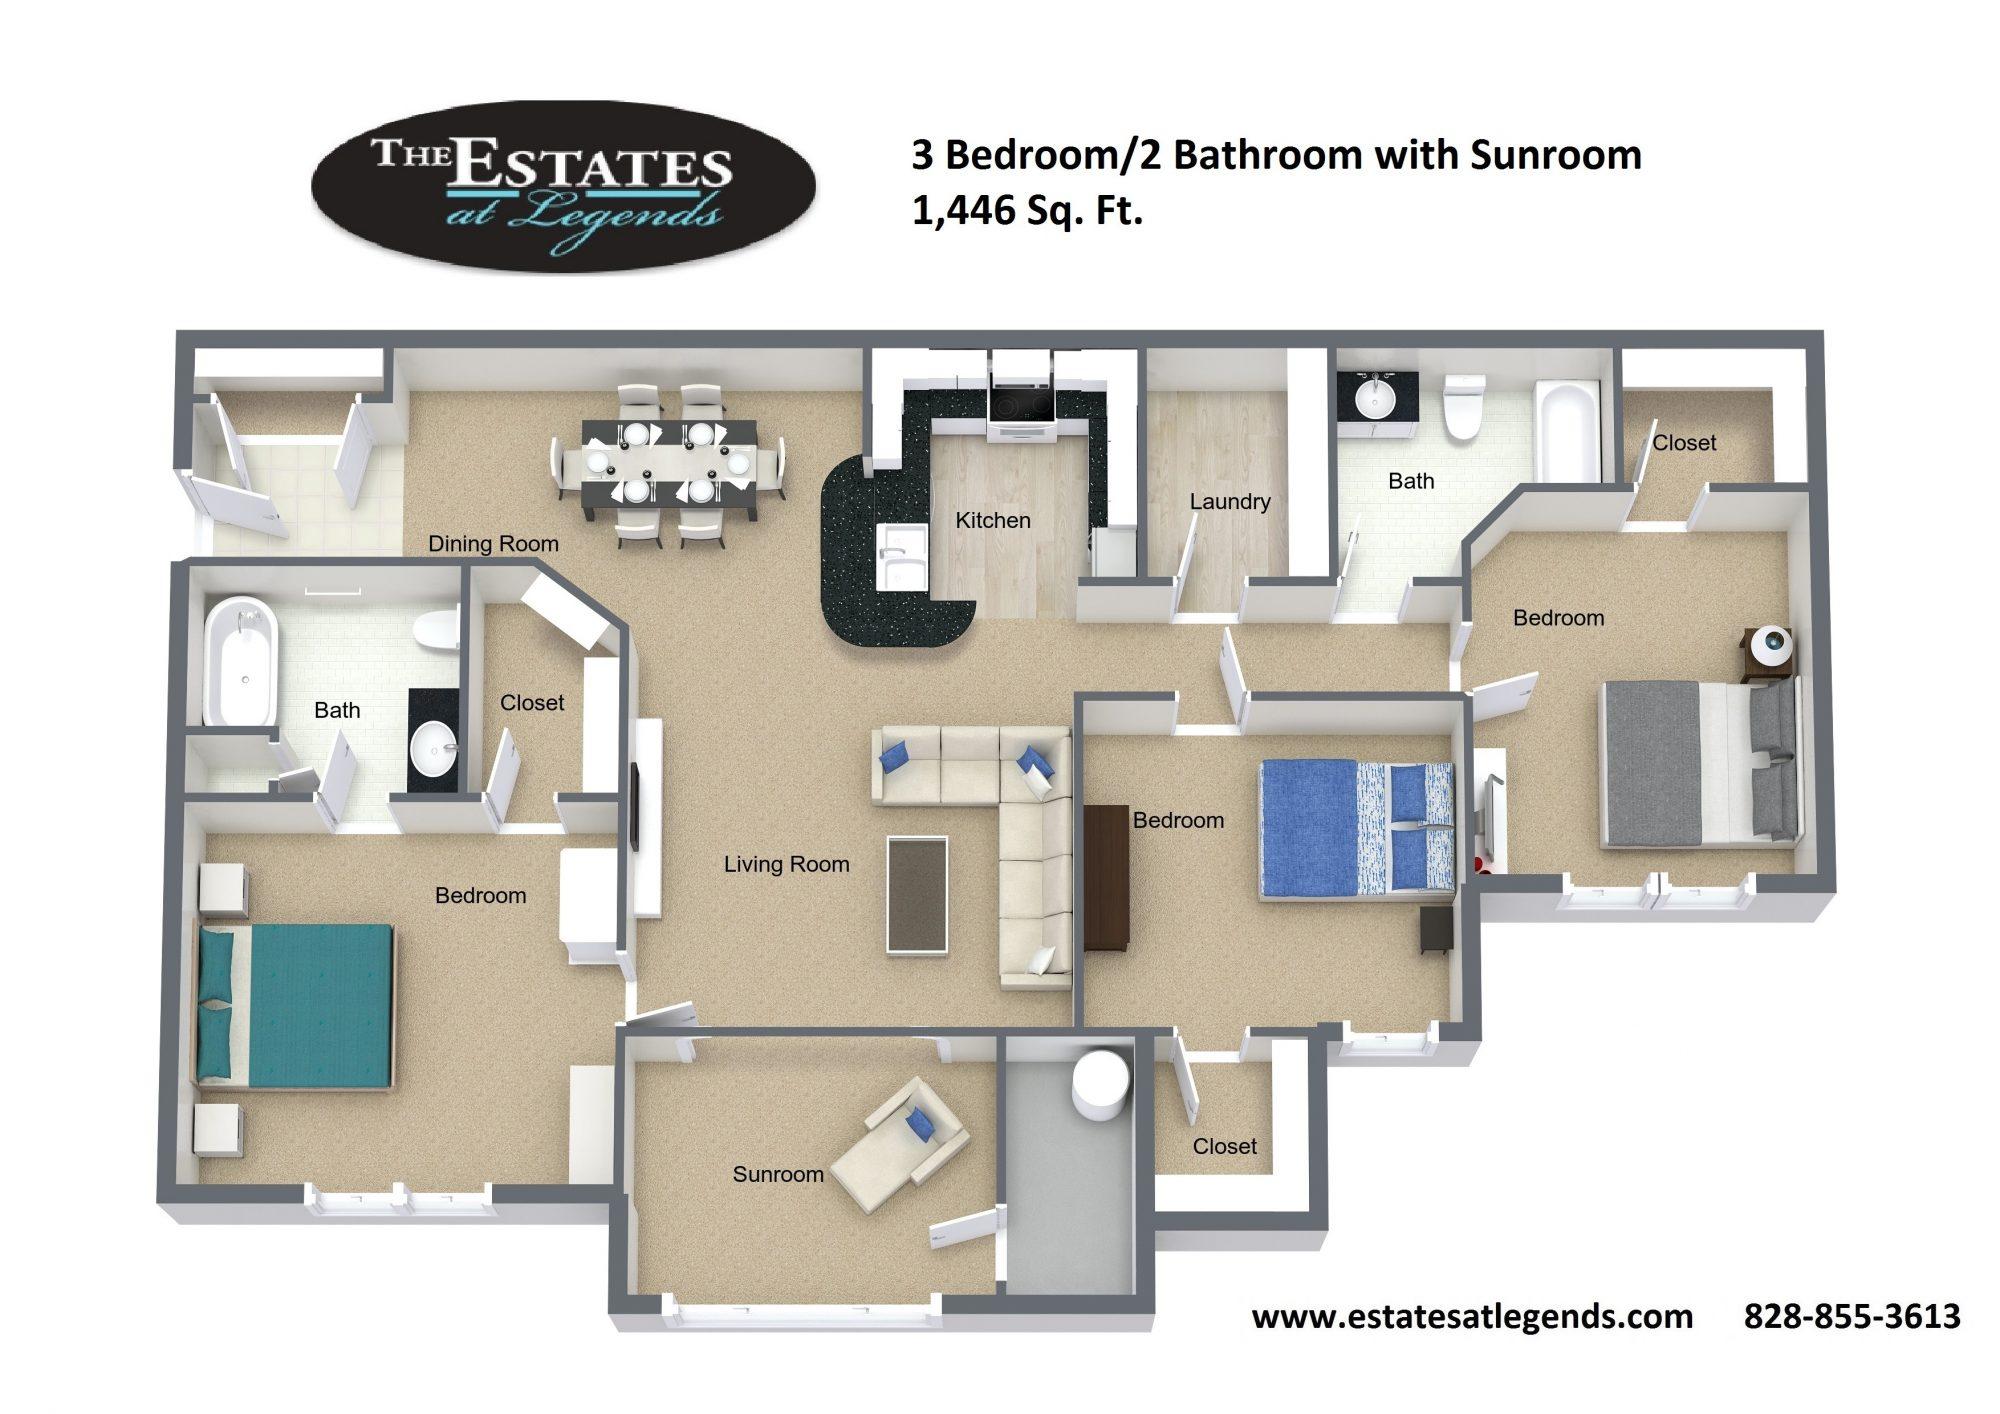 3d - 3 Bedroom 3 Bathroom with Sunroom